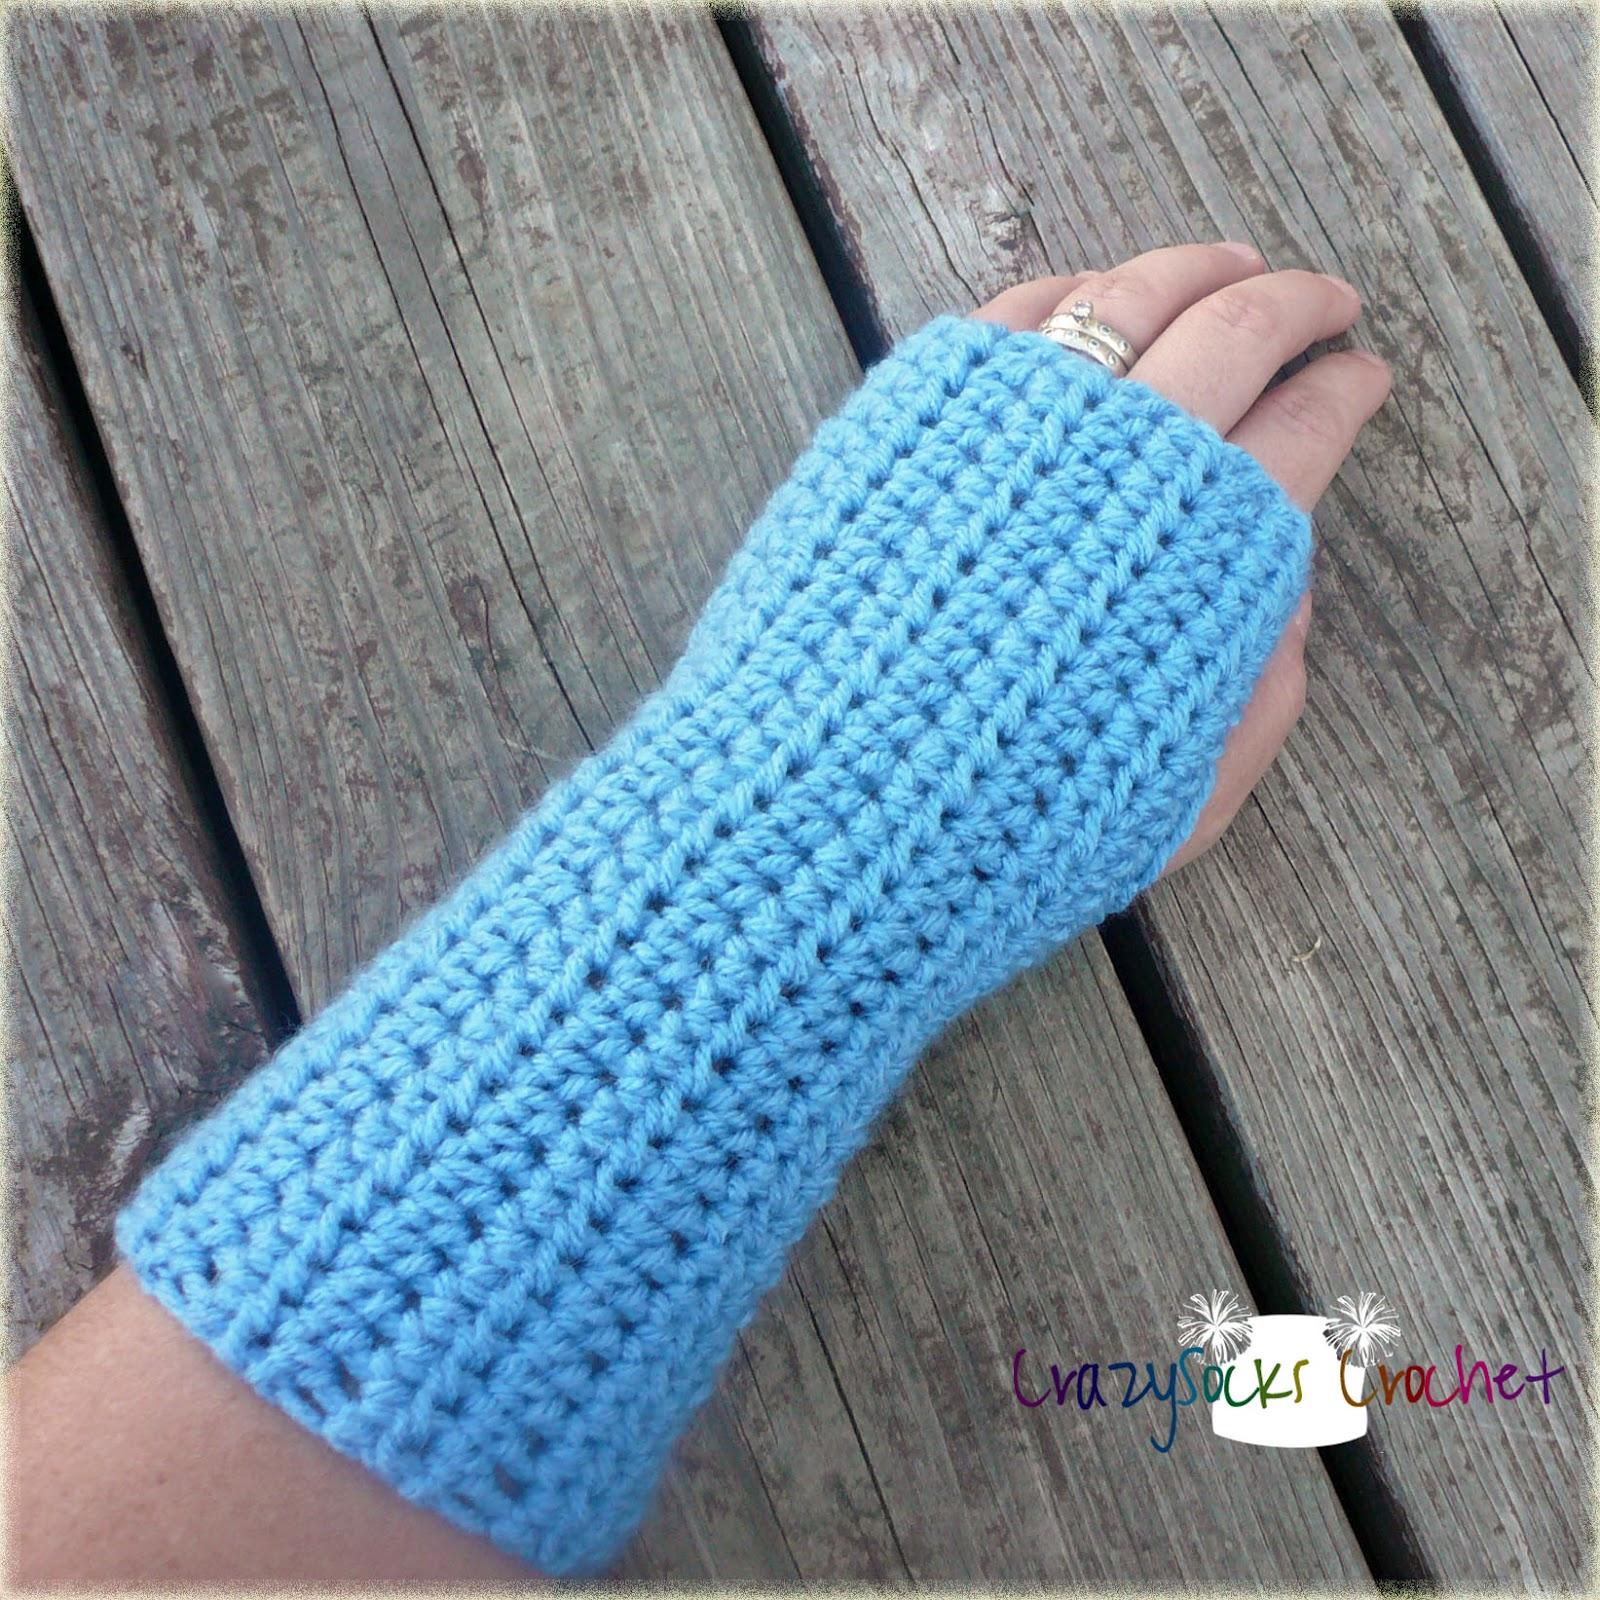 Willie Warmer Knitting Pattern Free Danyel Pink Designs Crochet Pattern Wrist Warmers